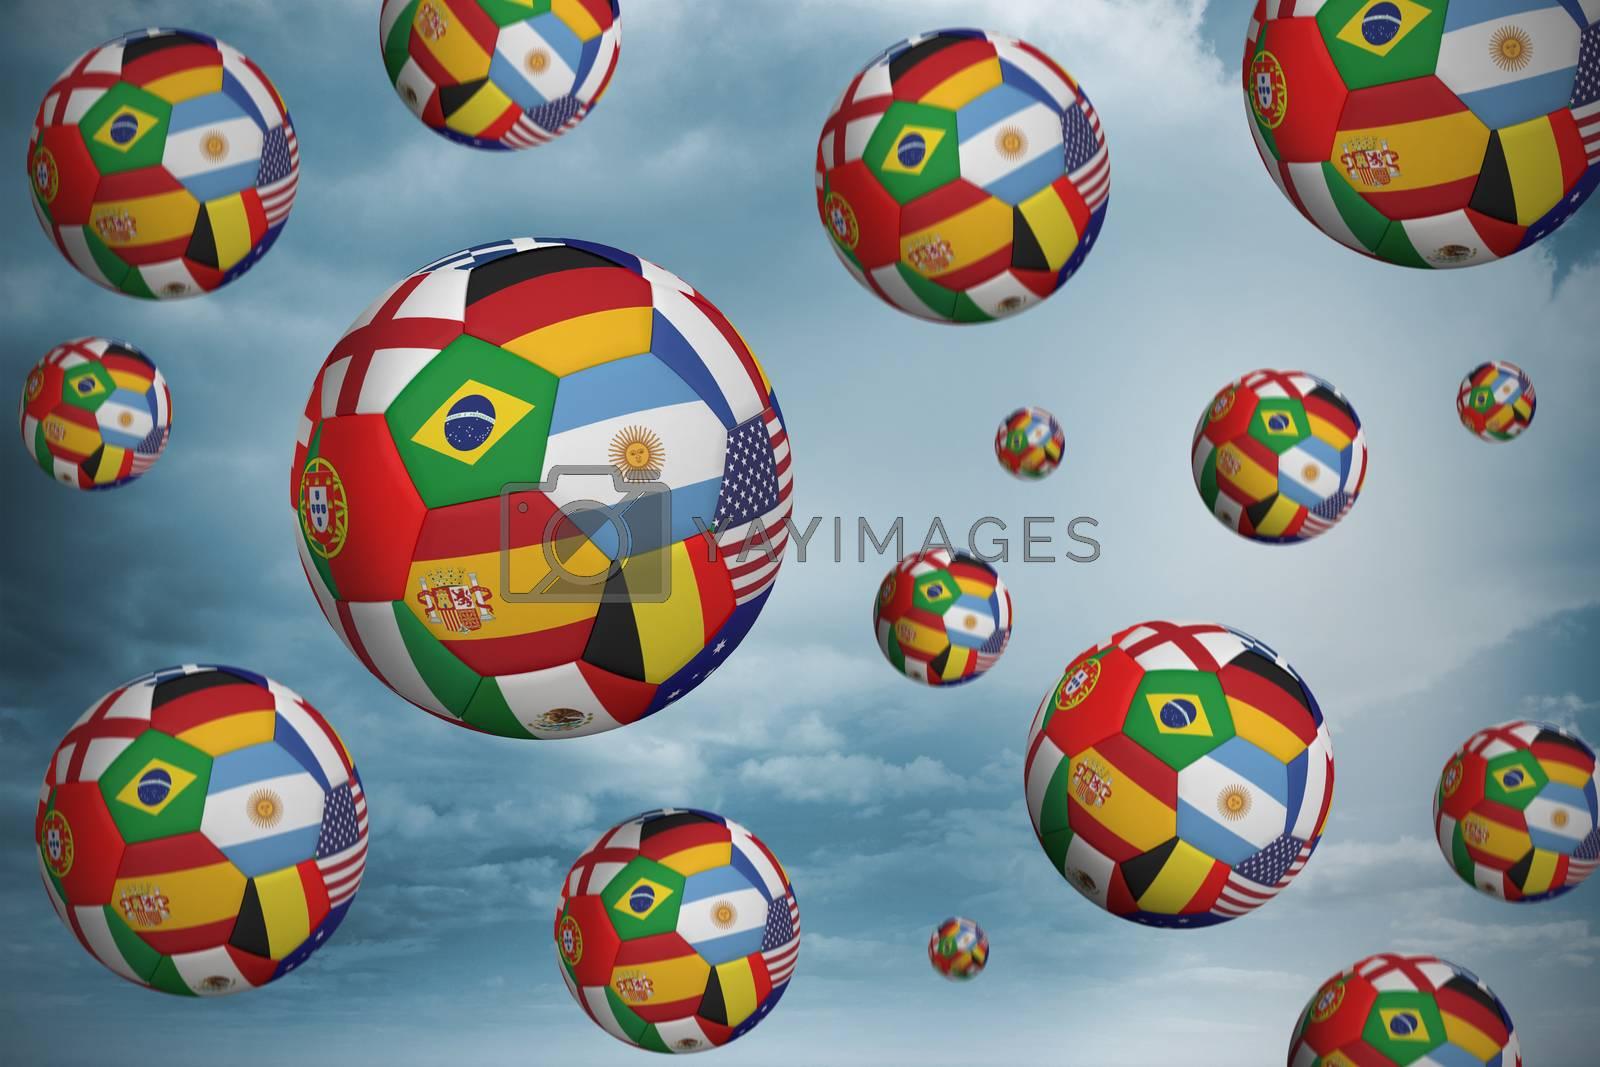 Footballs in international flags by Wavebreakmedia